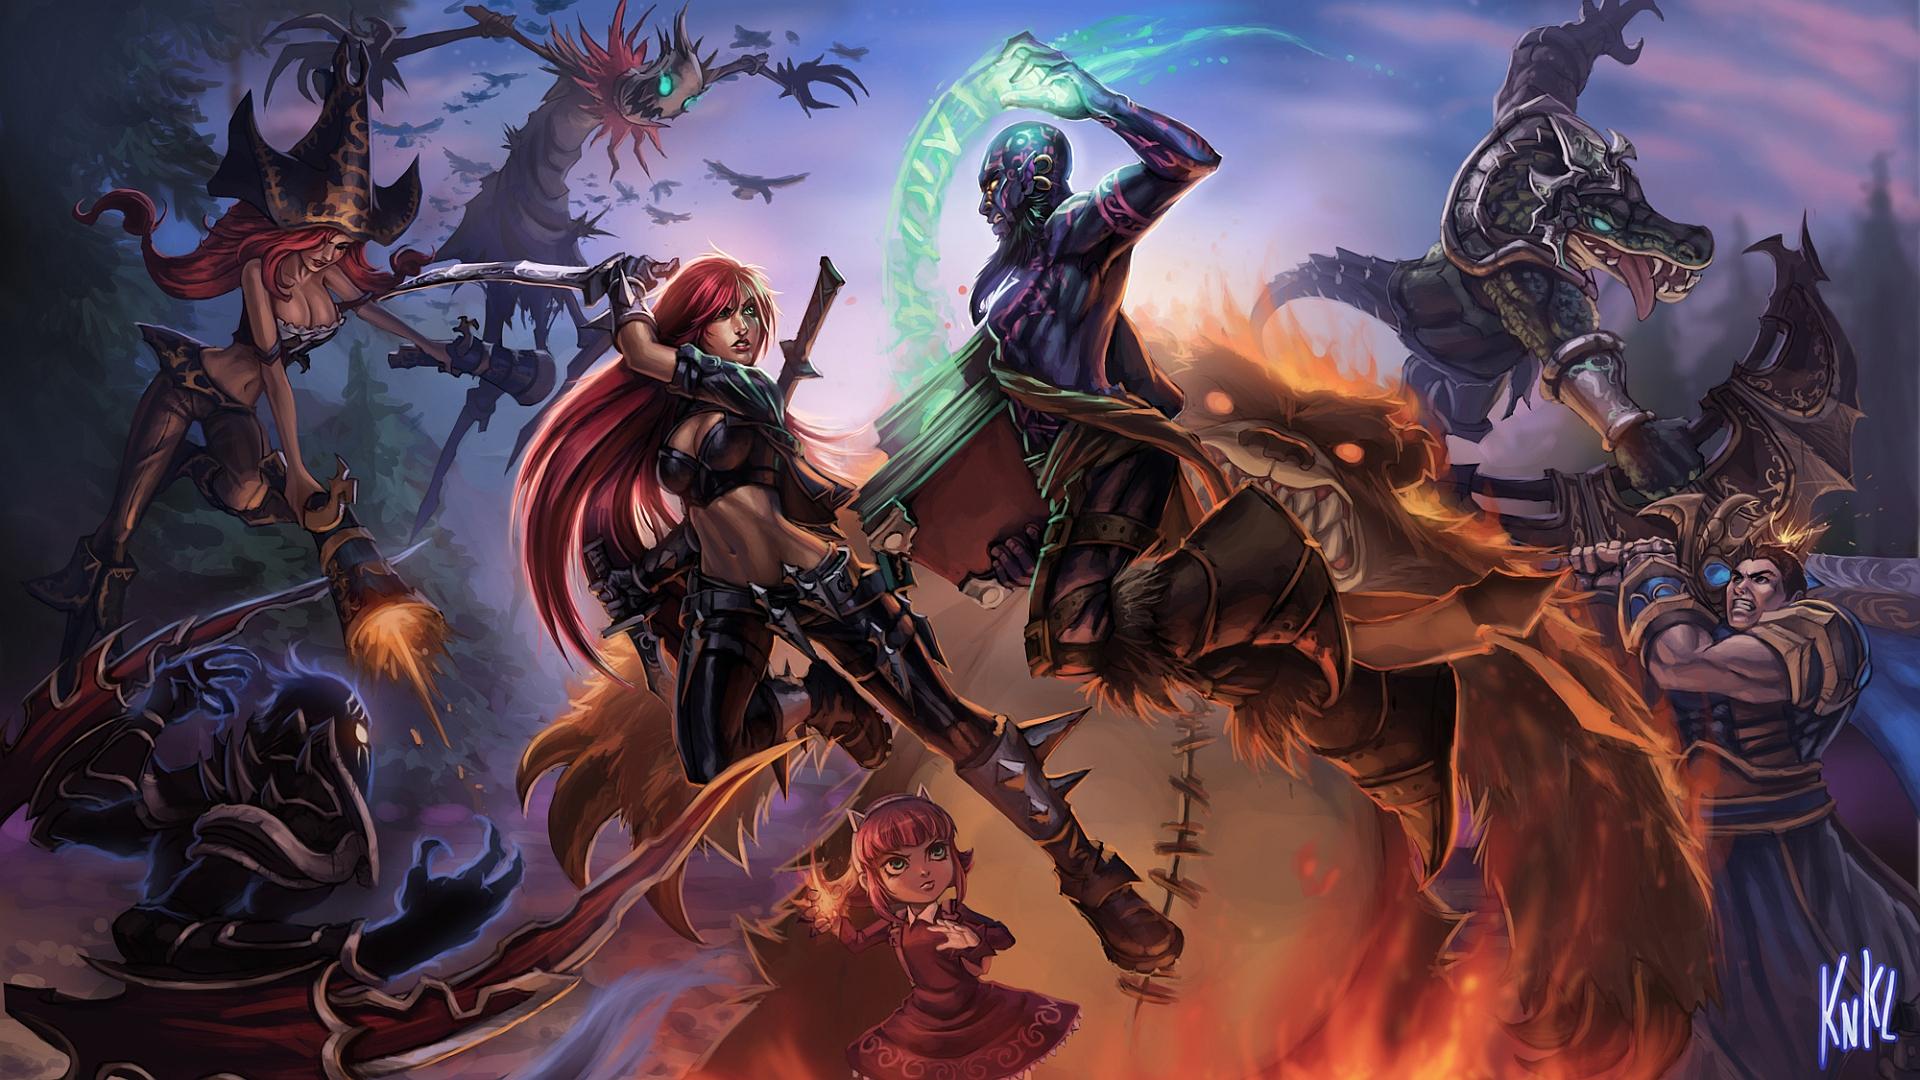 44 Garen (League Of Legends) HD Wallpapers | Backgrounds